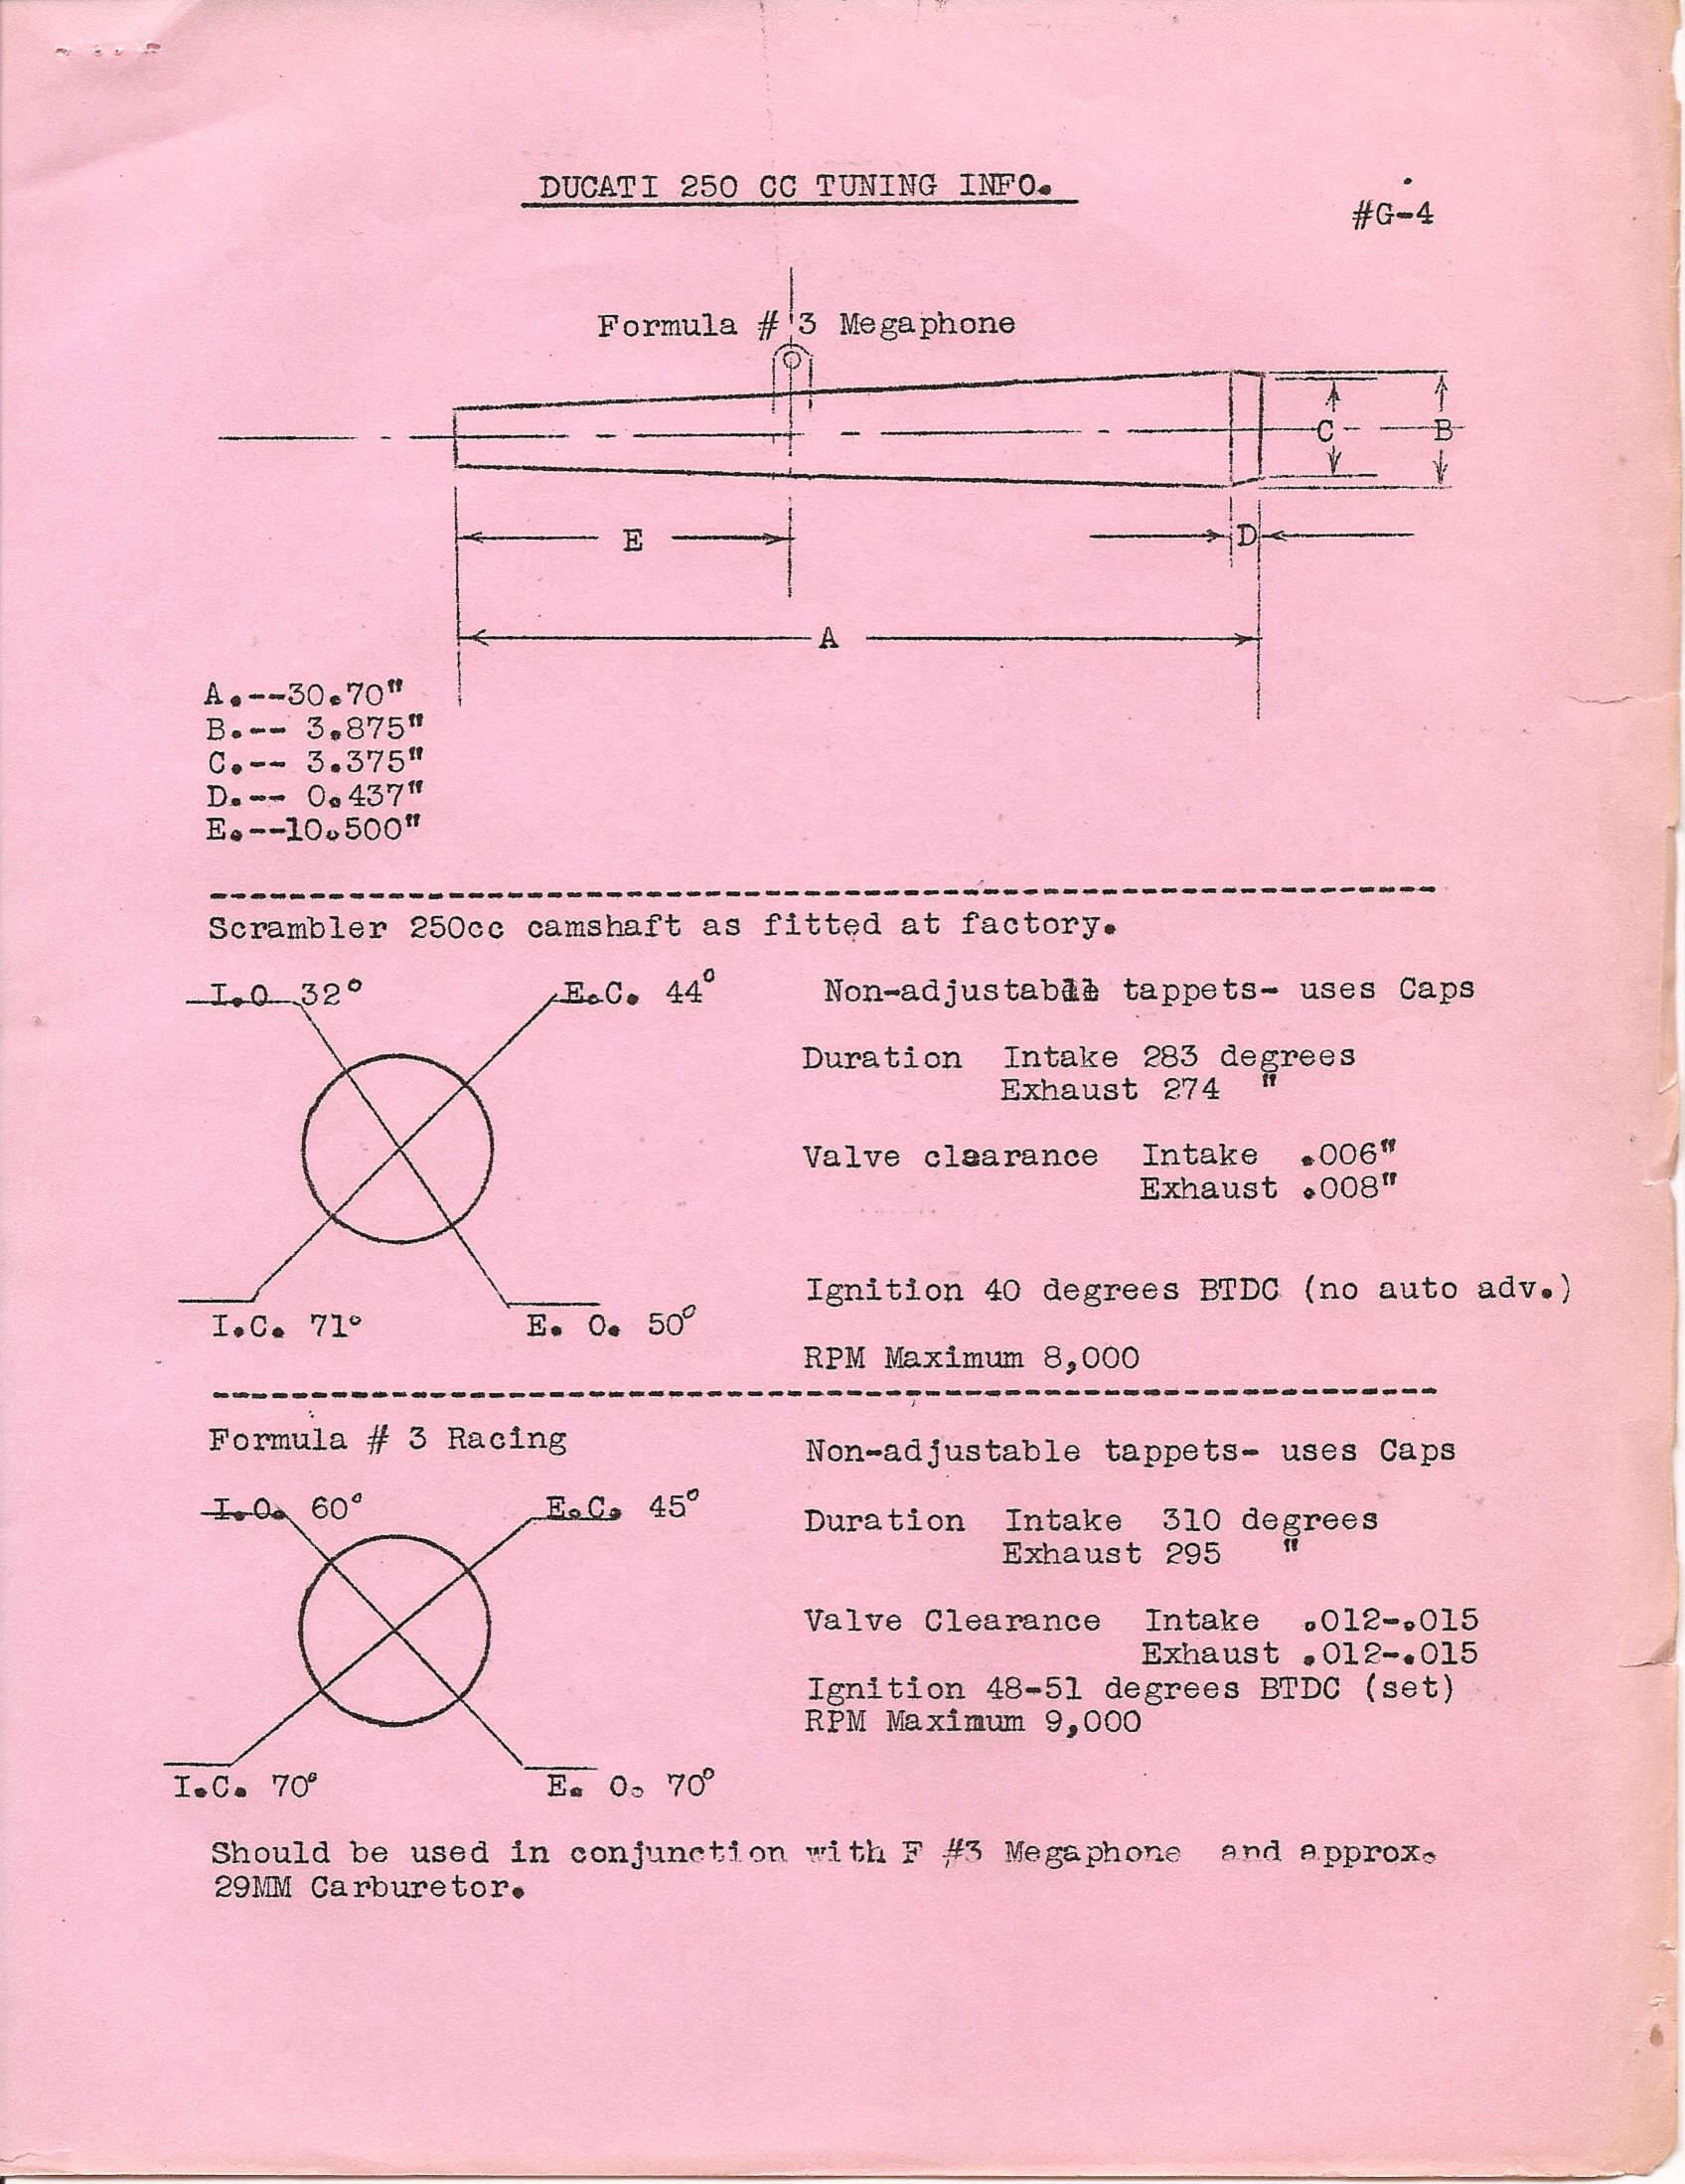 ducati singles technical information by motoscrubs com ducati ignition wiring diagram electrical equipment · bulletin g 4 ducati 250cc tuning info